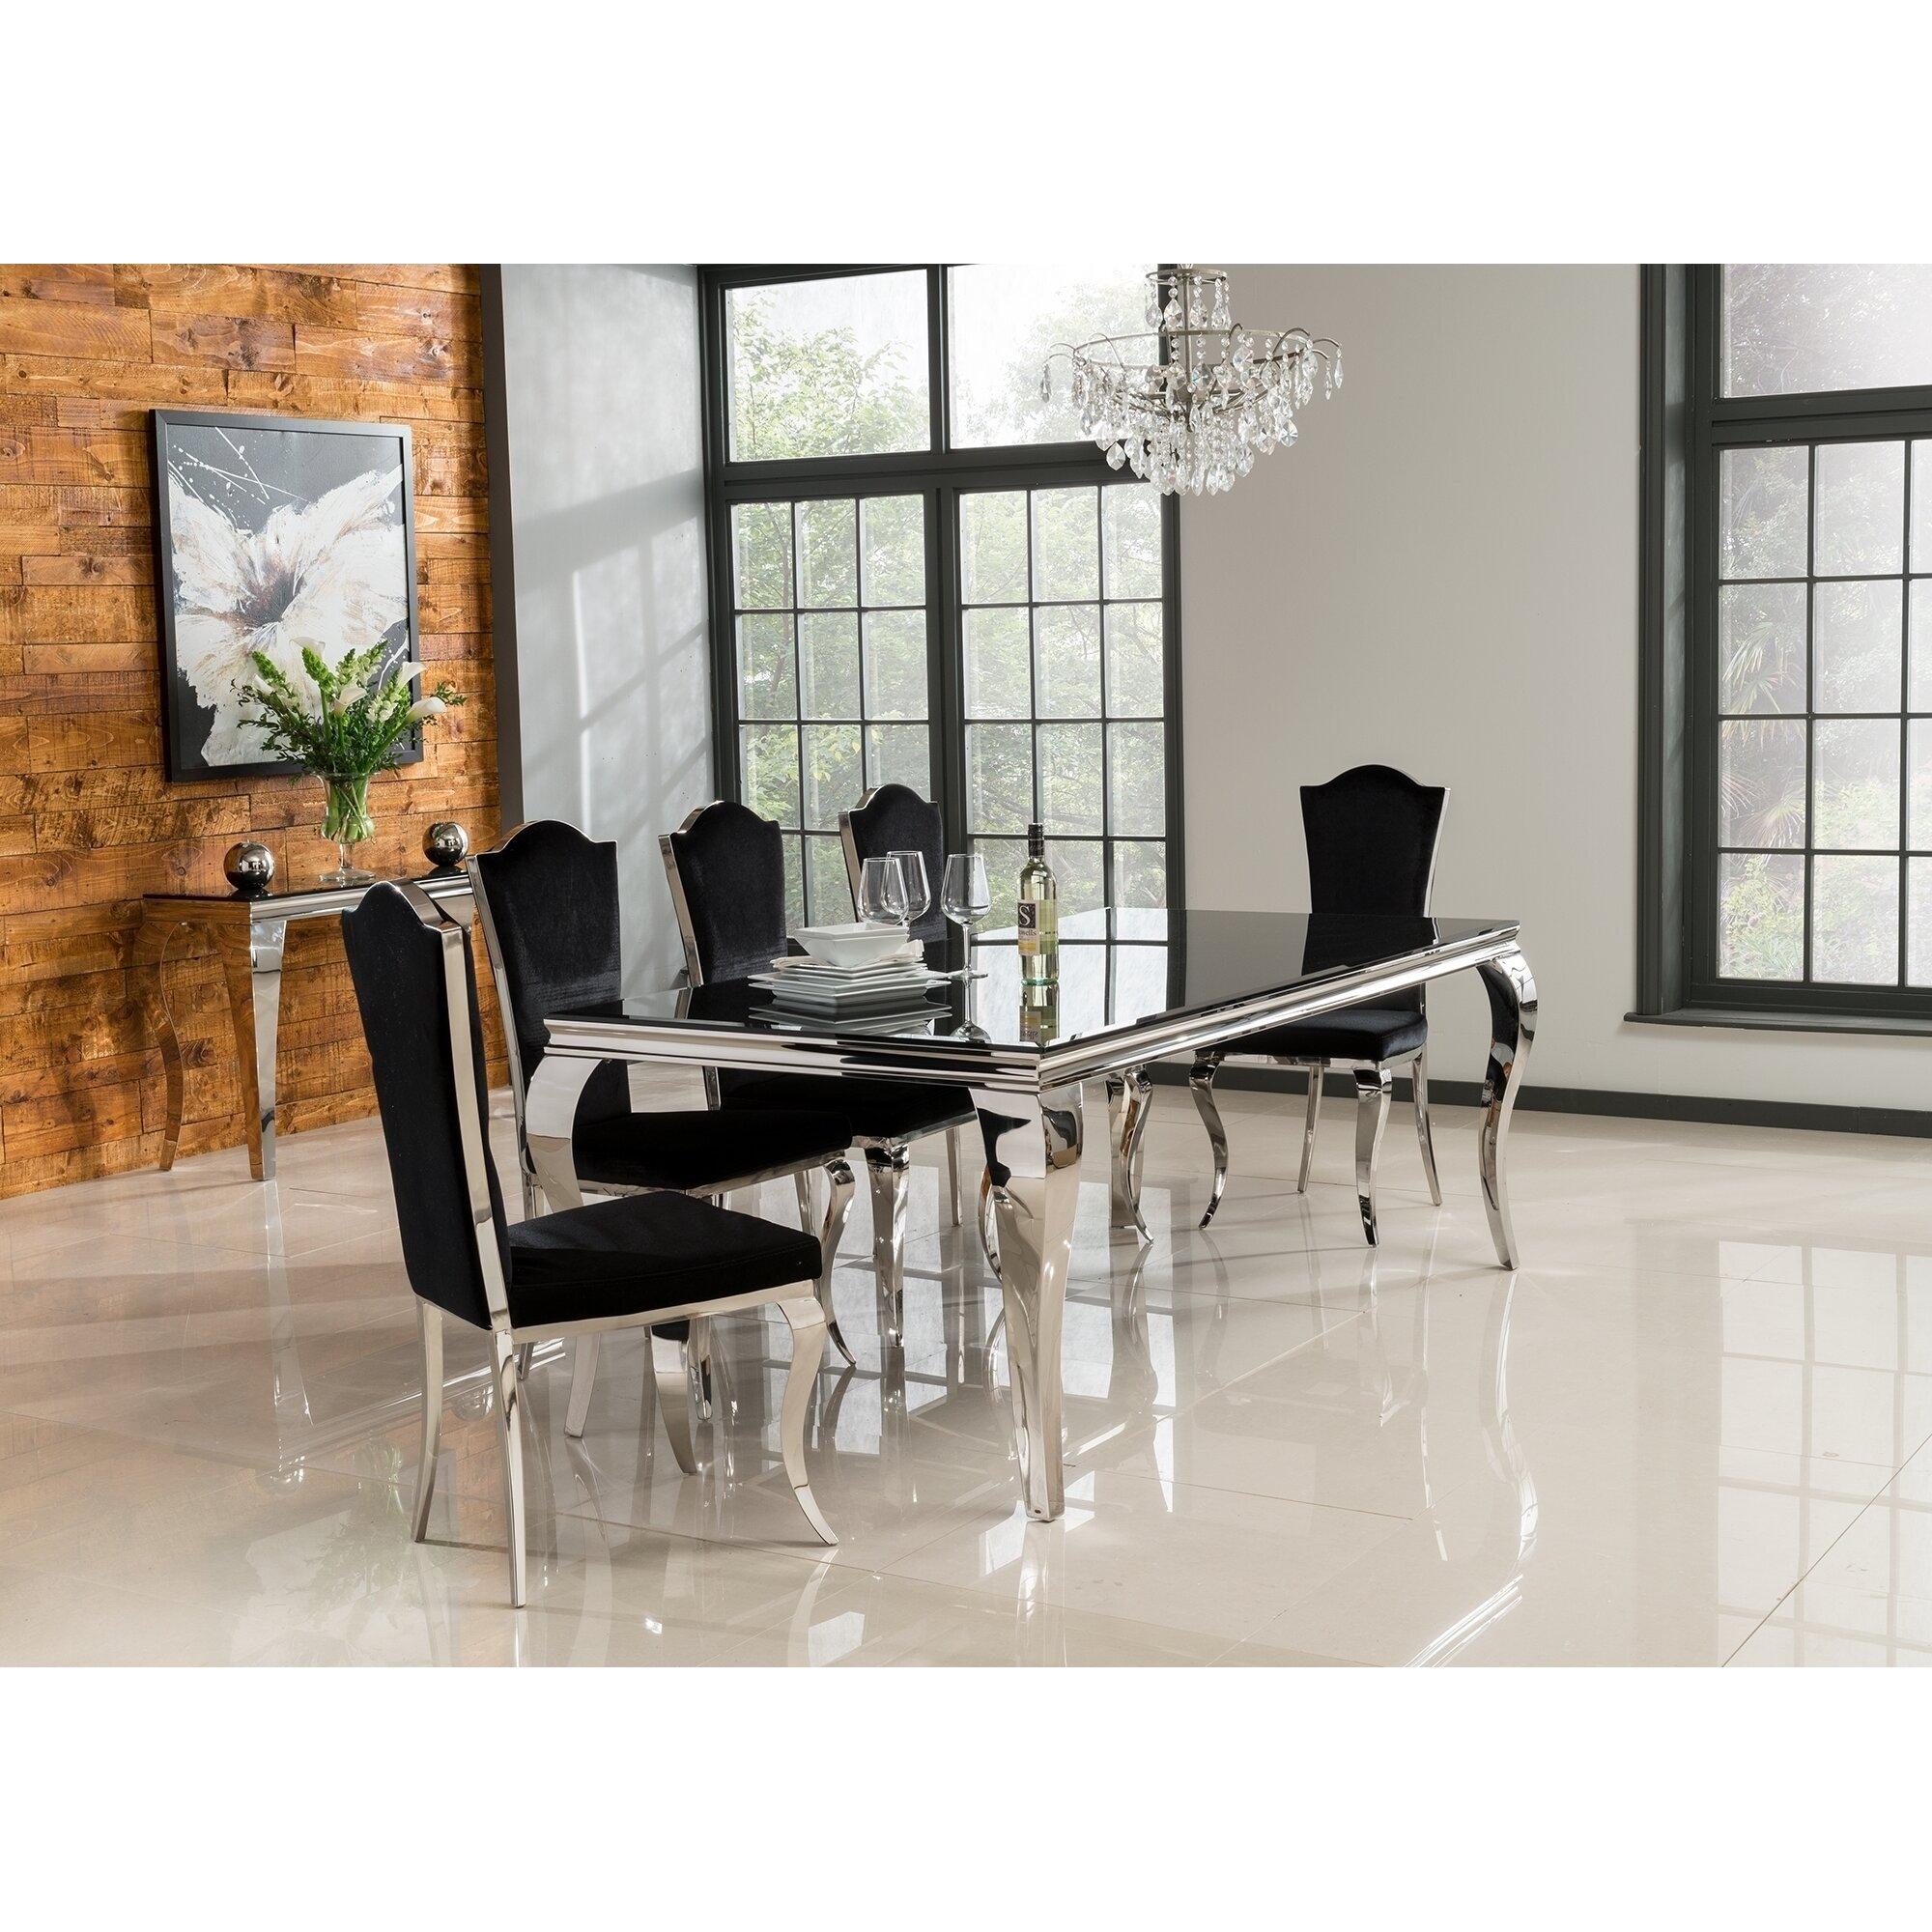 Hazelwood Home Louis Dining Table. Hazelwood Home Louis Dining Table   Reviews   Wayfair co uk